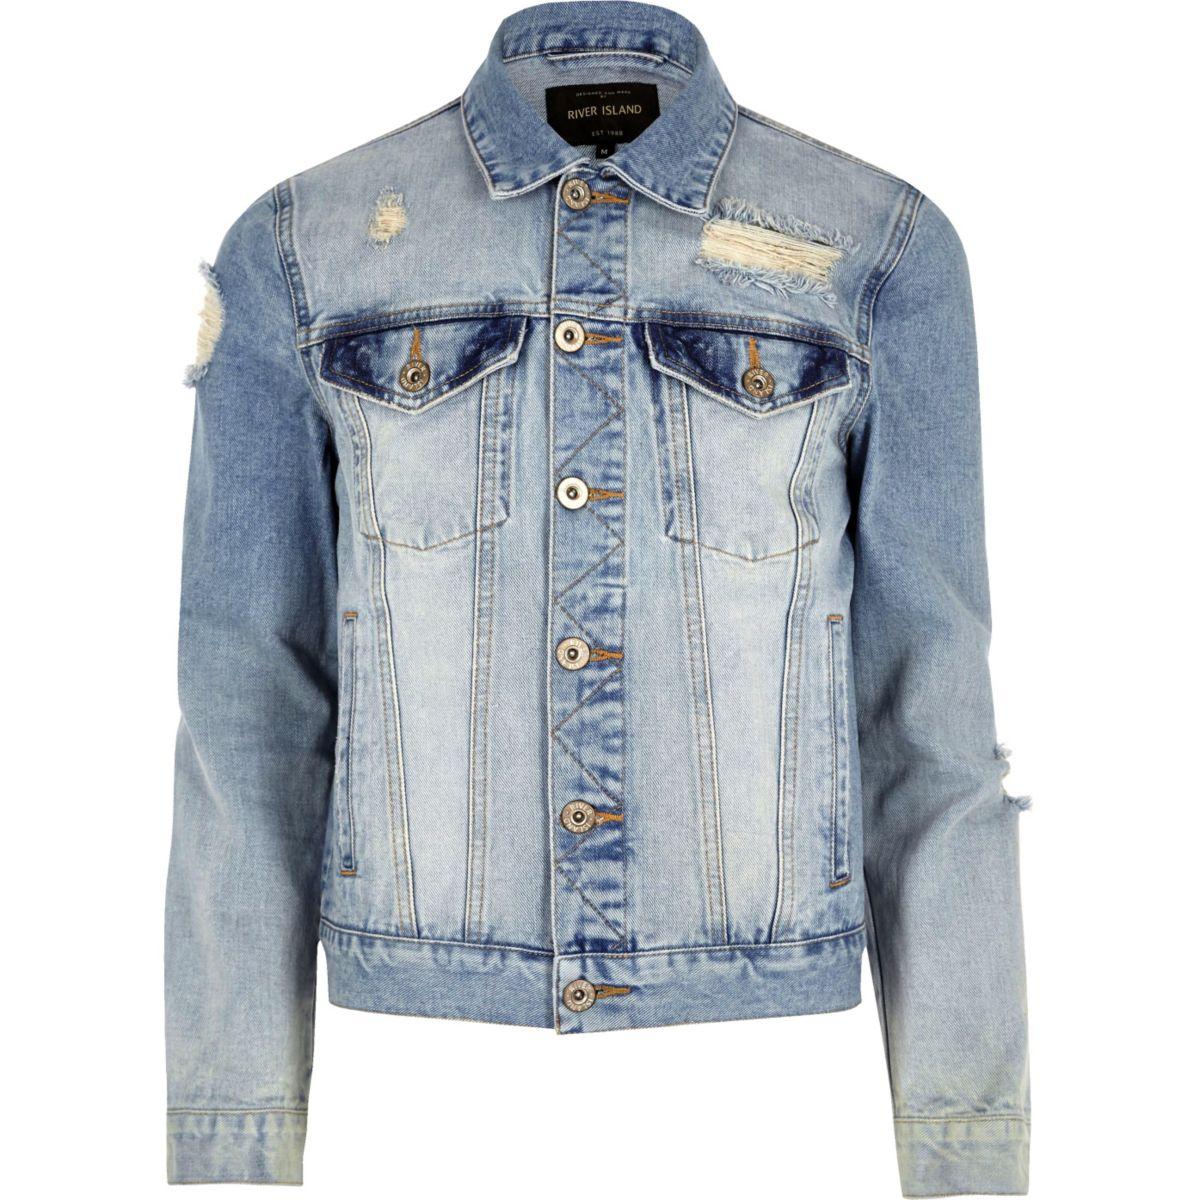 Light blue casual distressed denim jacket